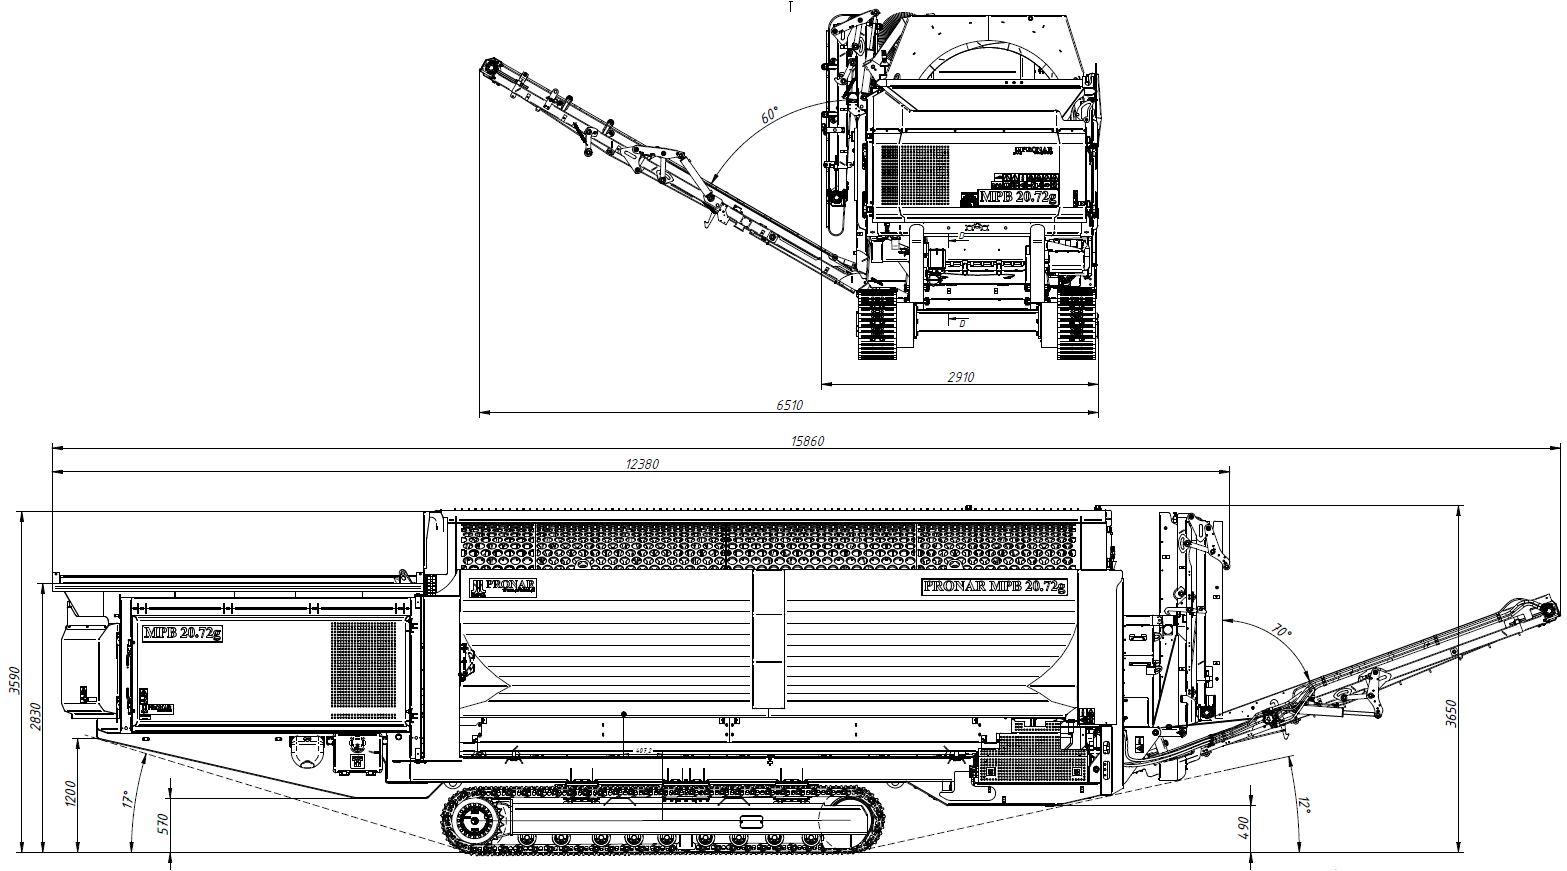 mpb-20-72g-wymiary-rysunek